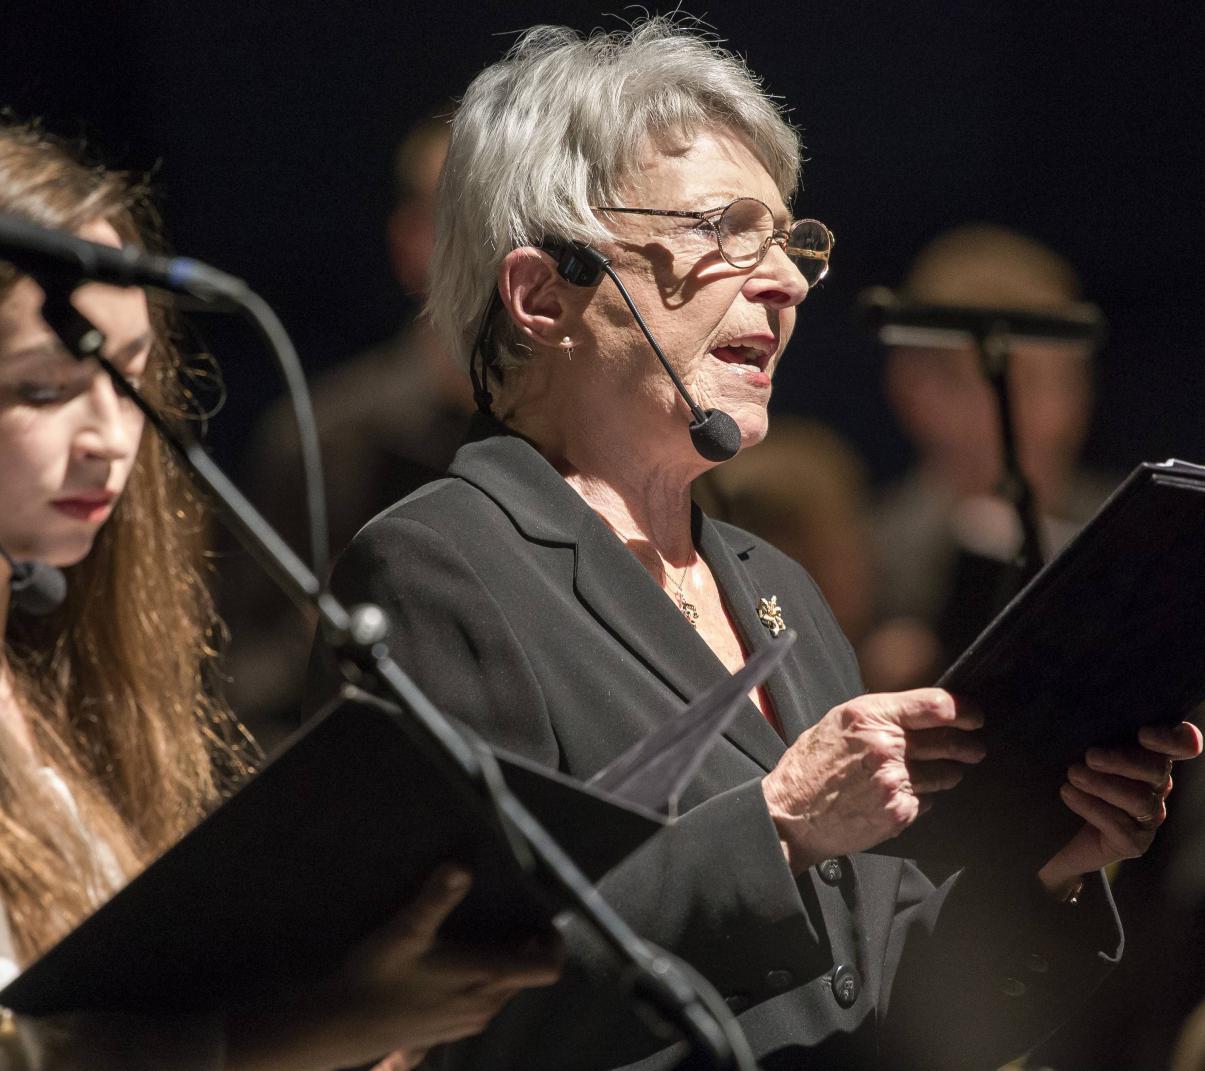 Marketa Lazarová live (foto Petra Hajská, 2015)